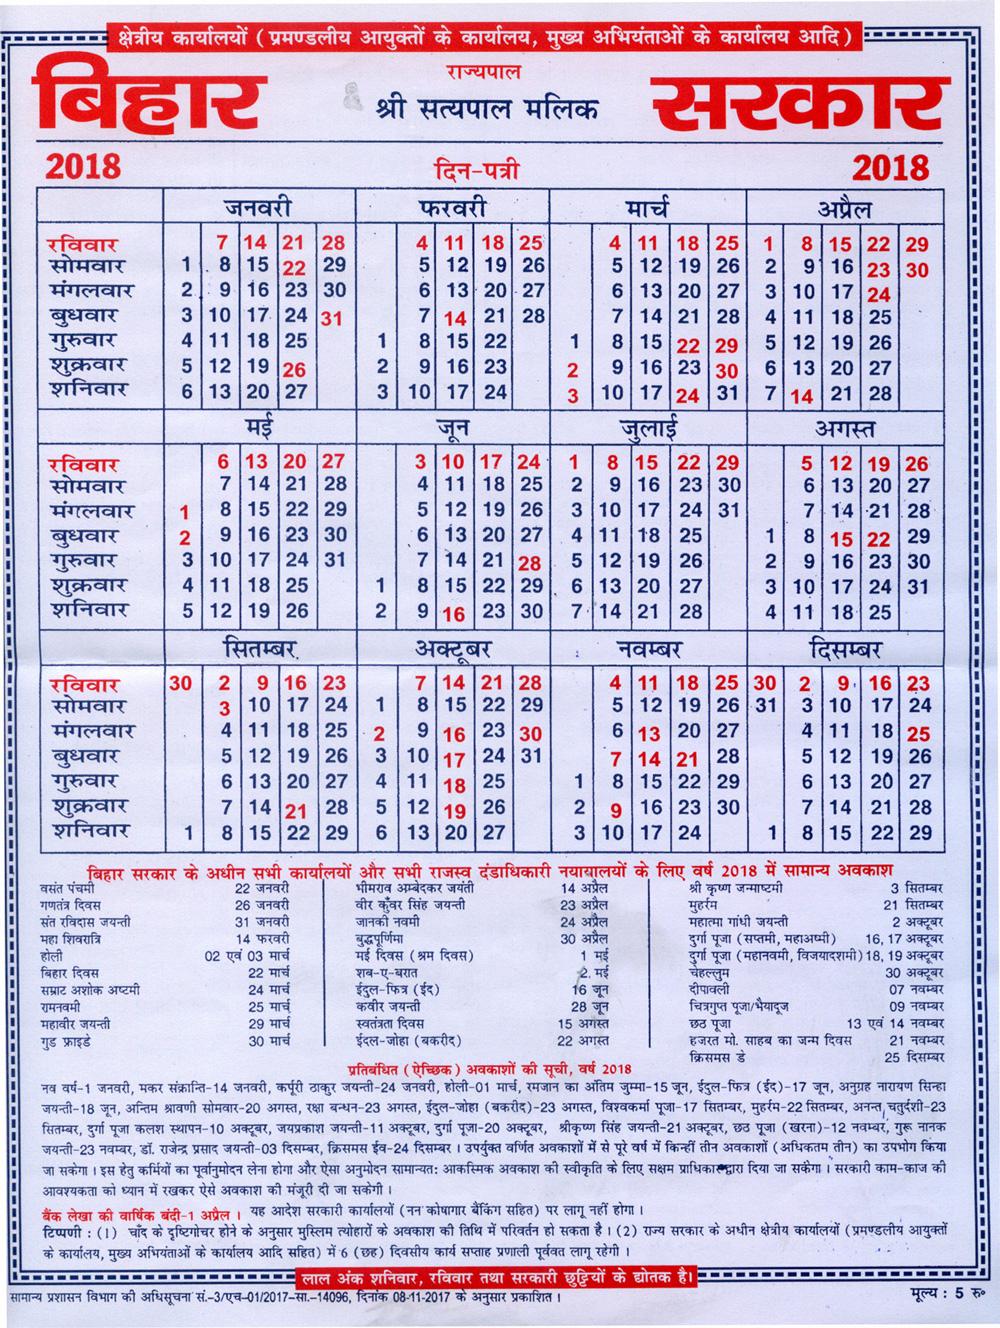 Bihar Govt. Calendar 2018, Bihar Govt. Holiday List, Holiday within Bihar Govt. Calendar 2020